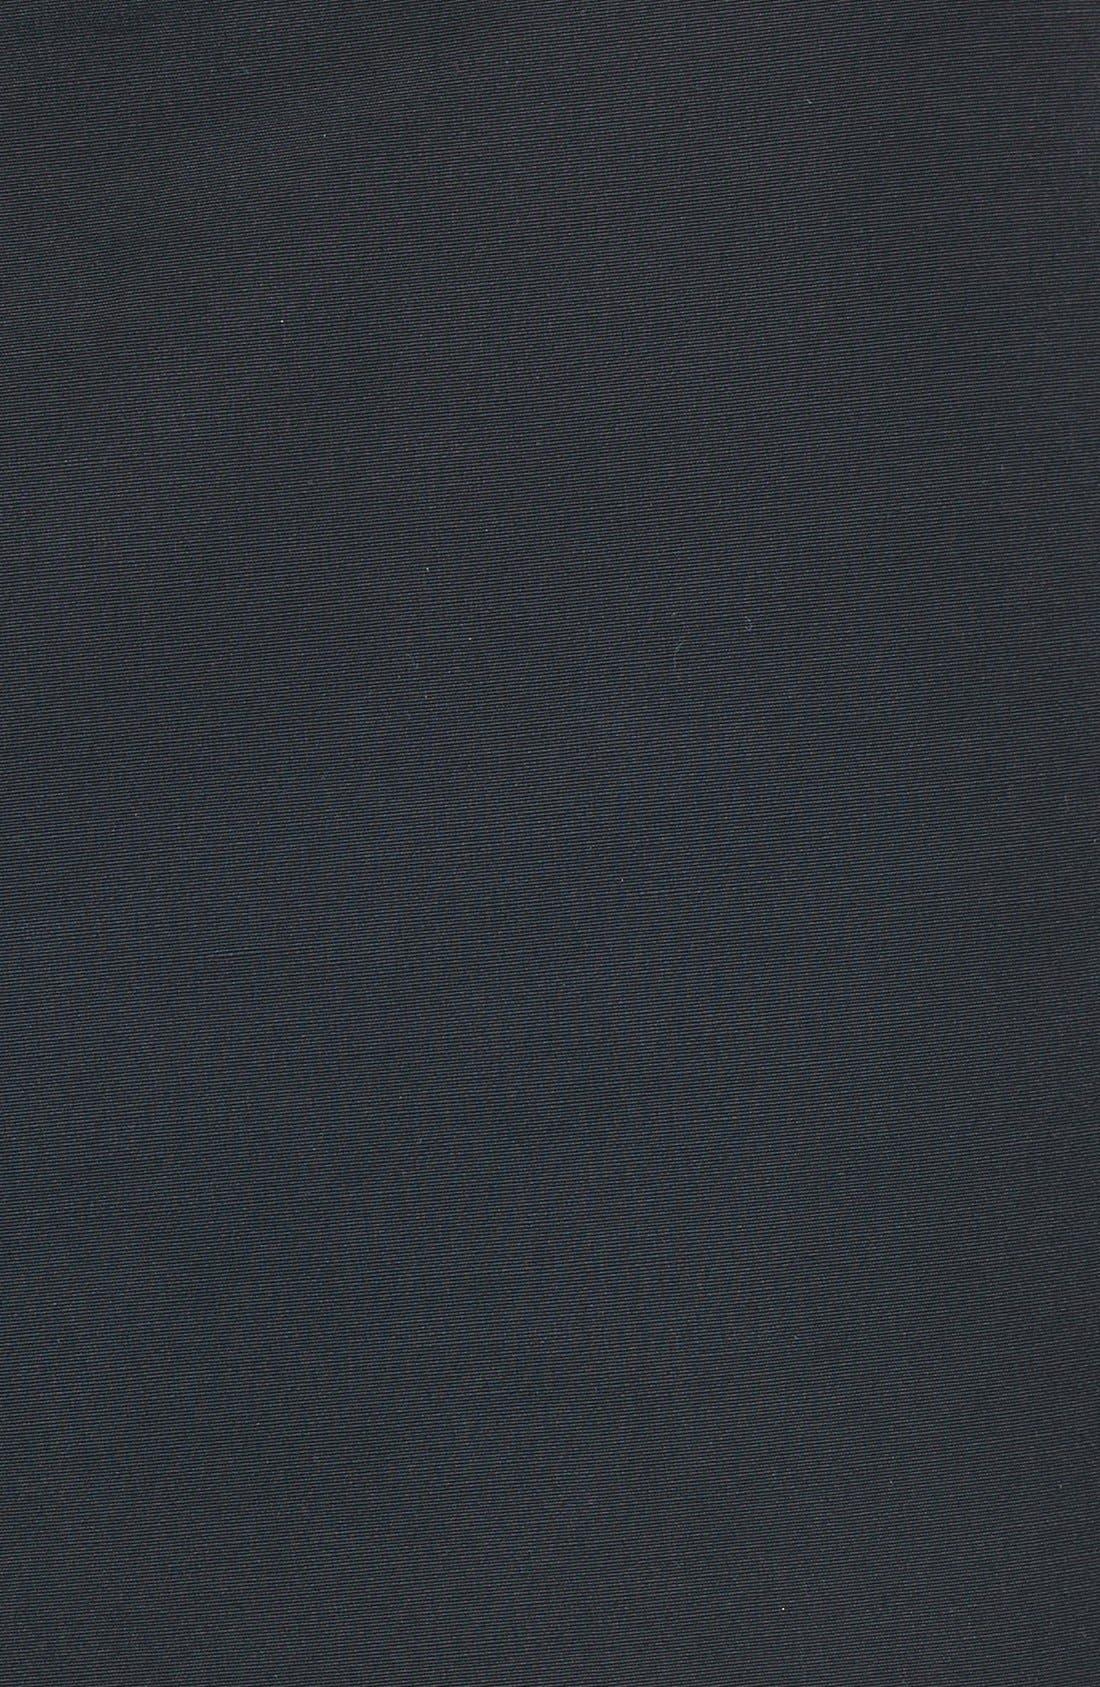 Alternate Image 3  - Tommy Bahama 'Hampton' Hybrid Swim Trunks